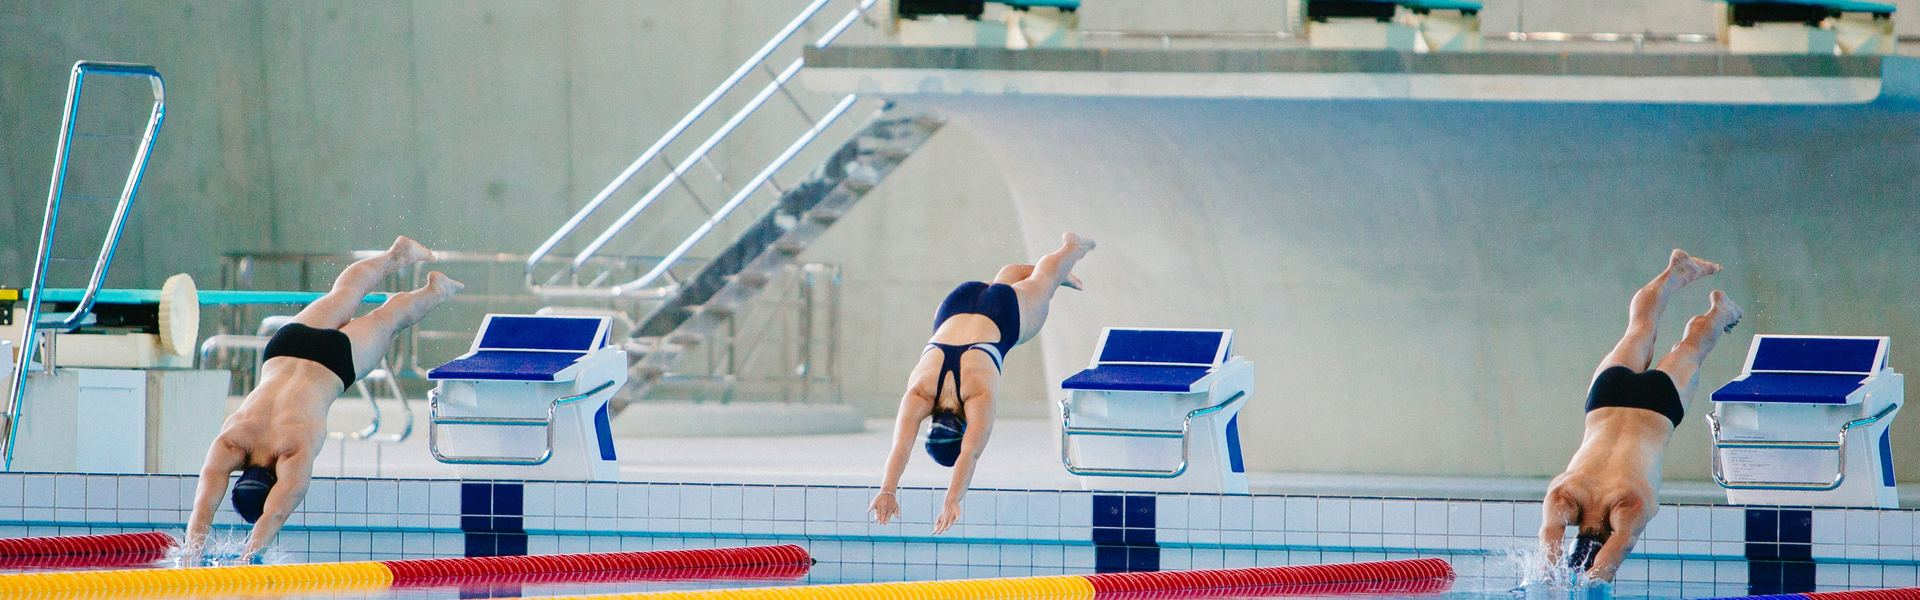 natation toulon